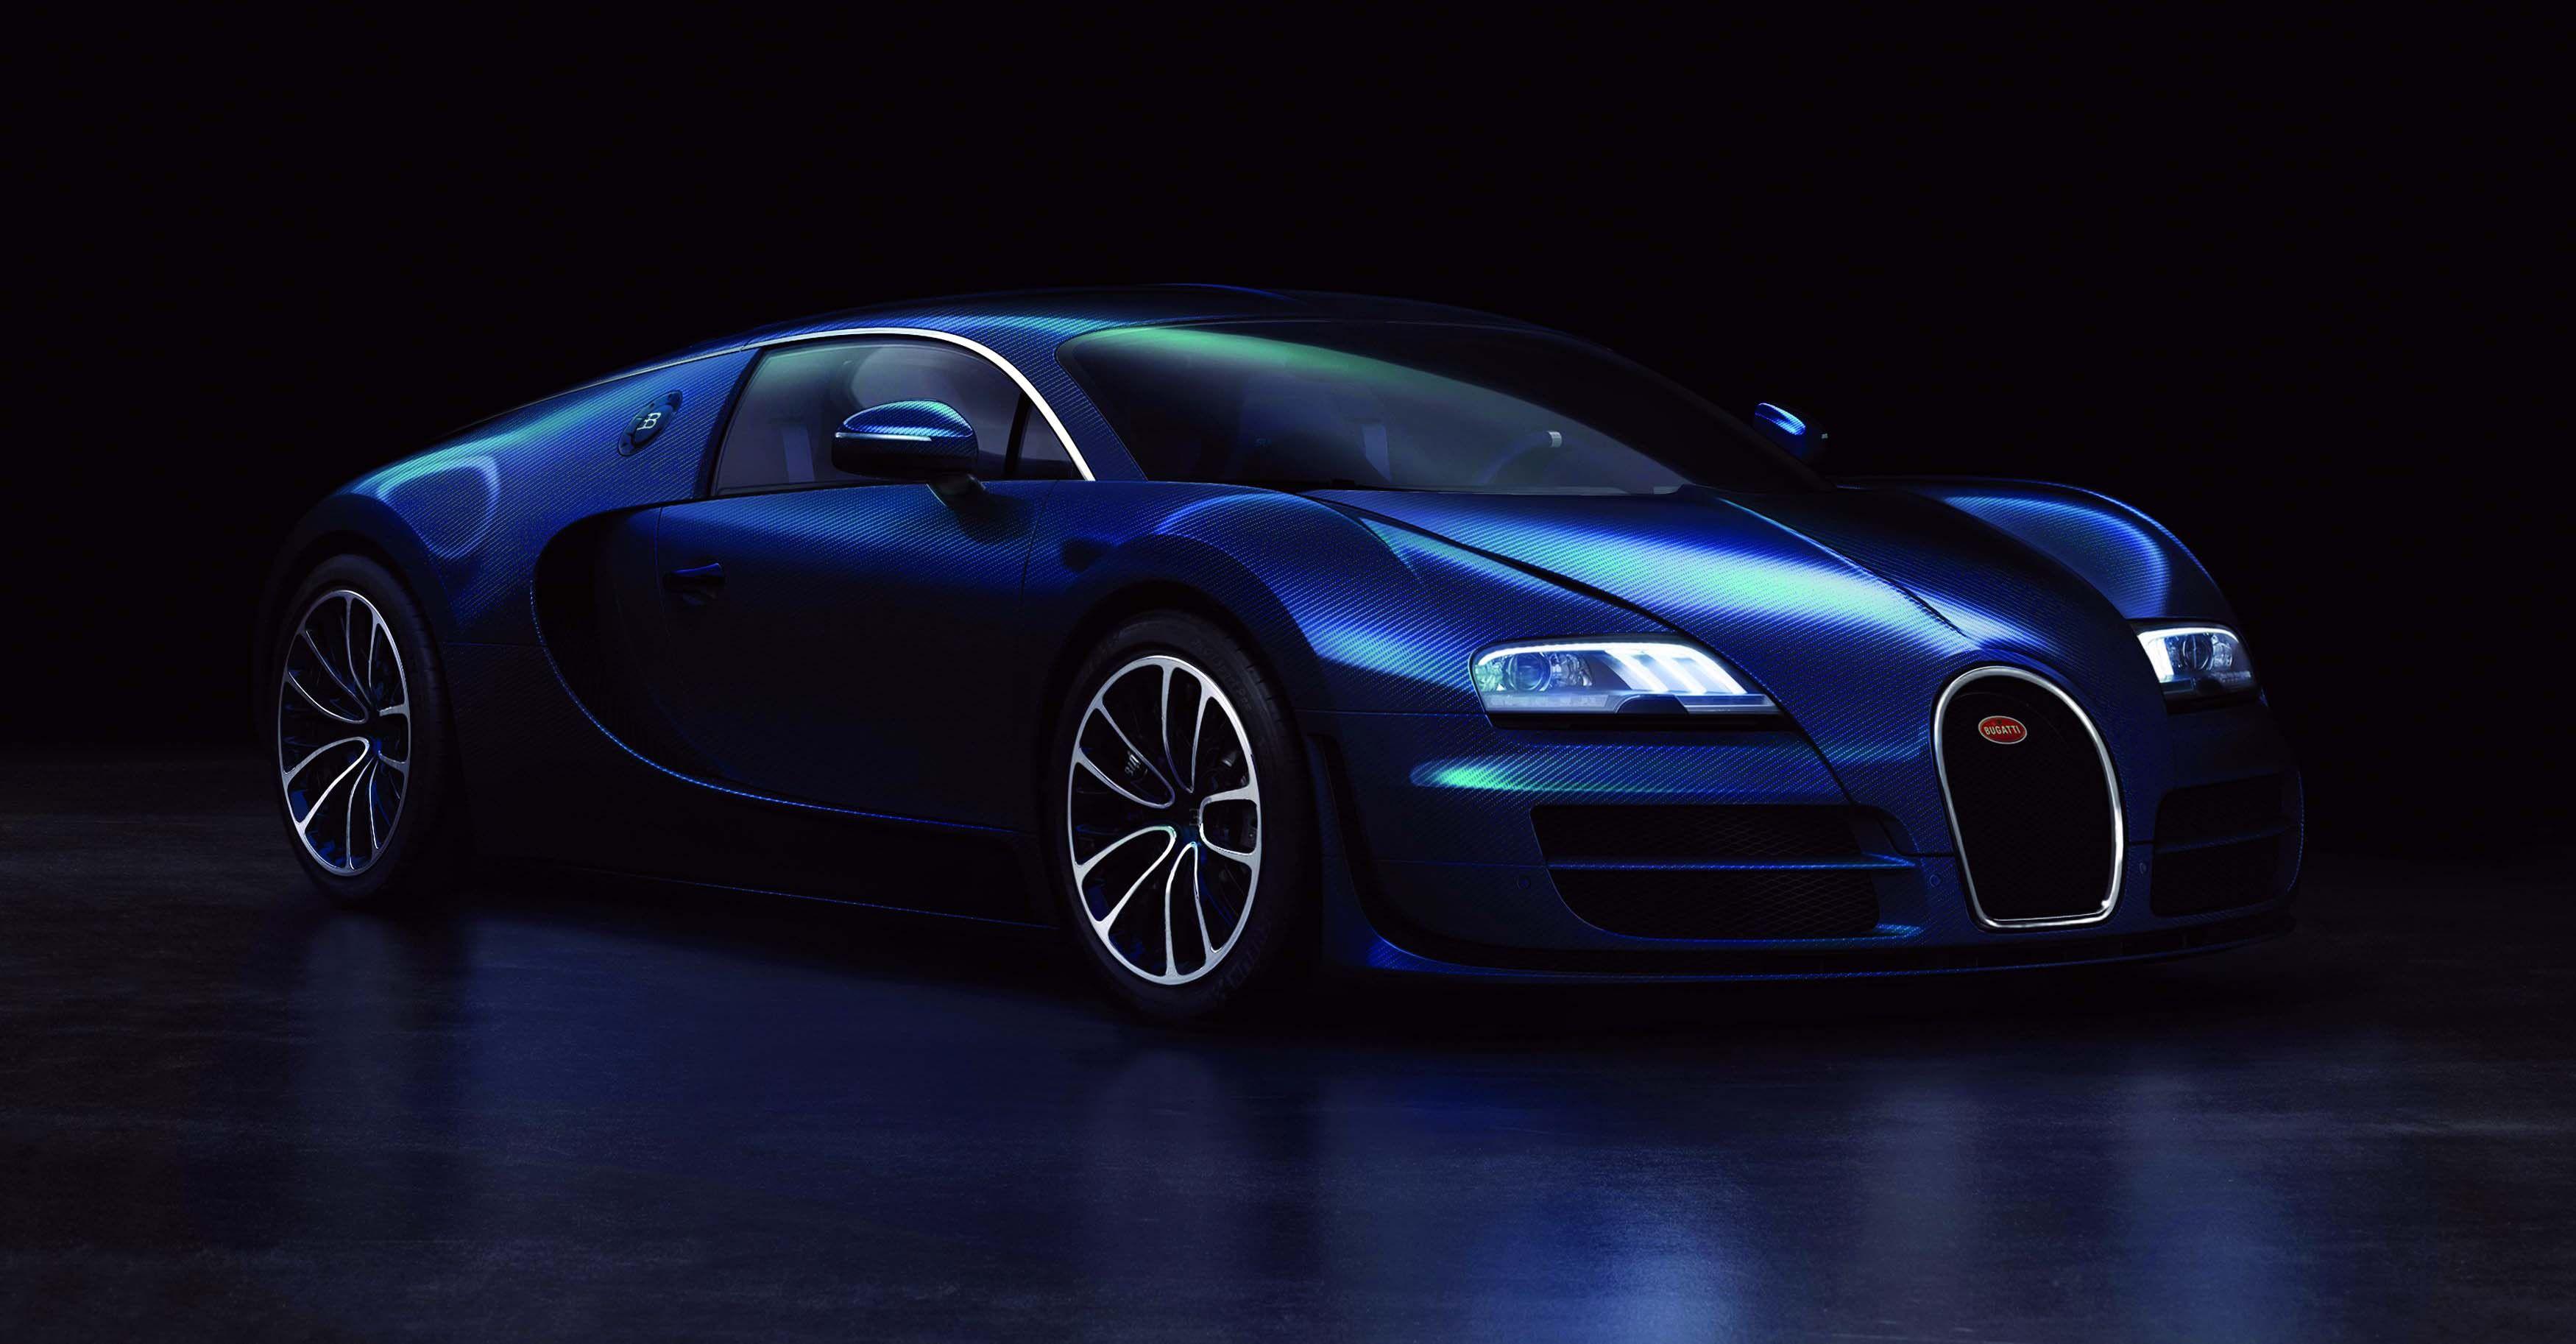 Blue Bugatti Veyron 2016 Desktop Wallpapers Hd Morewallpapers Com Bugatti Veyron Bugatti Veyron Super Sport Super Sport Cars